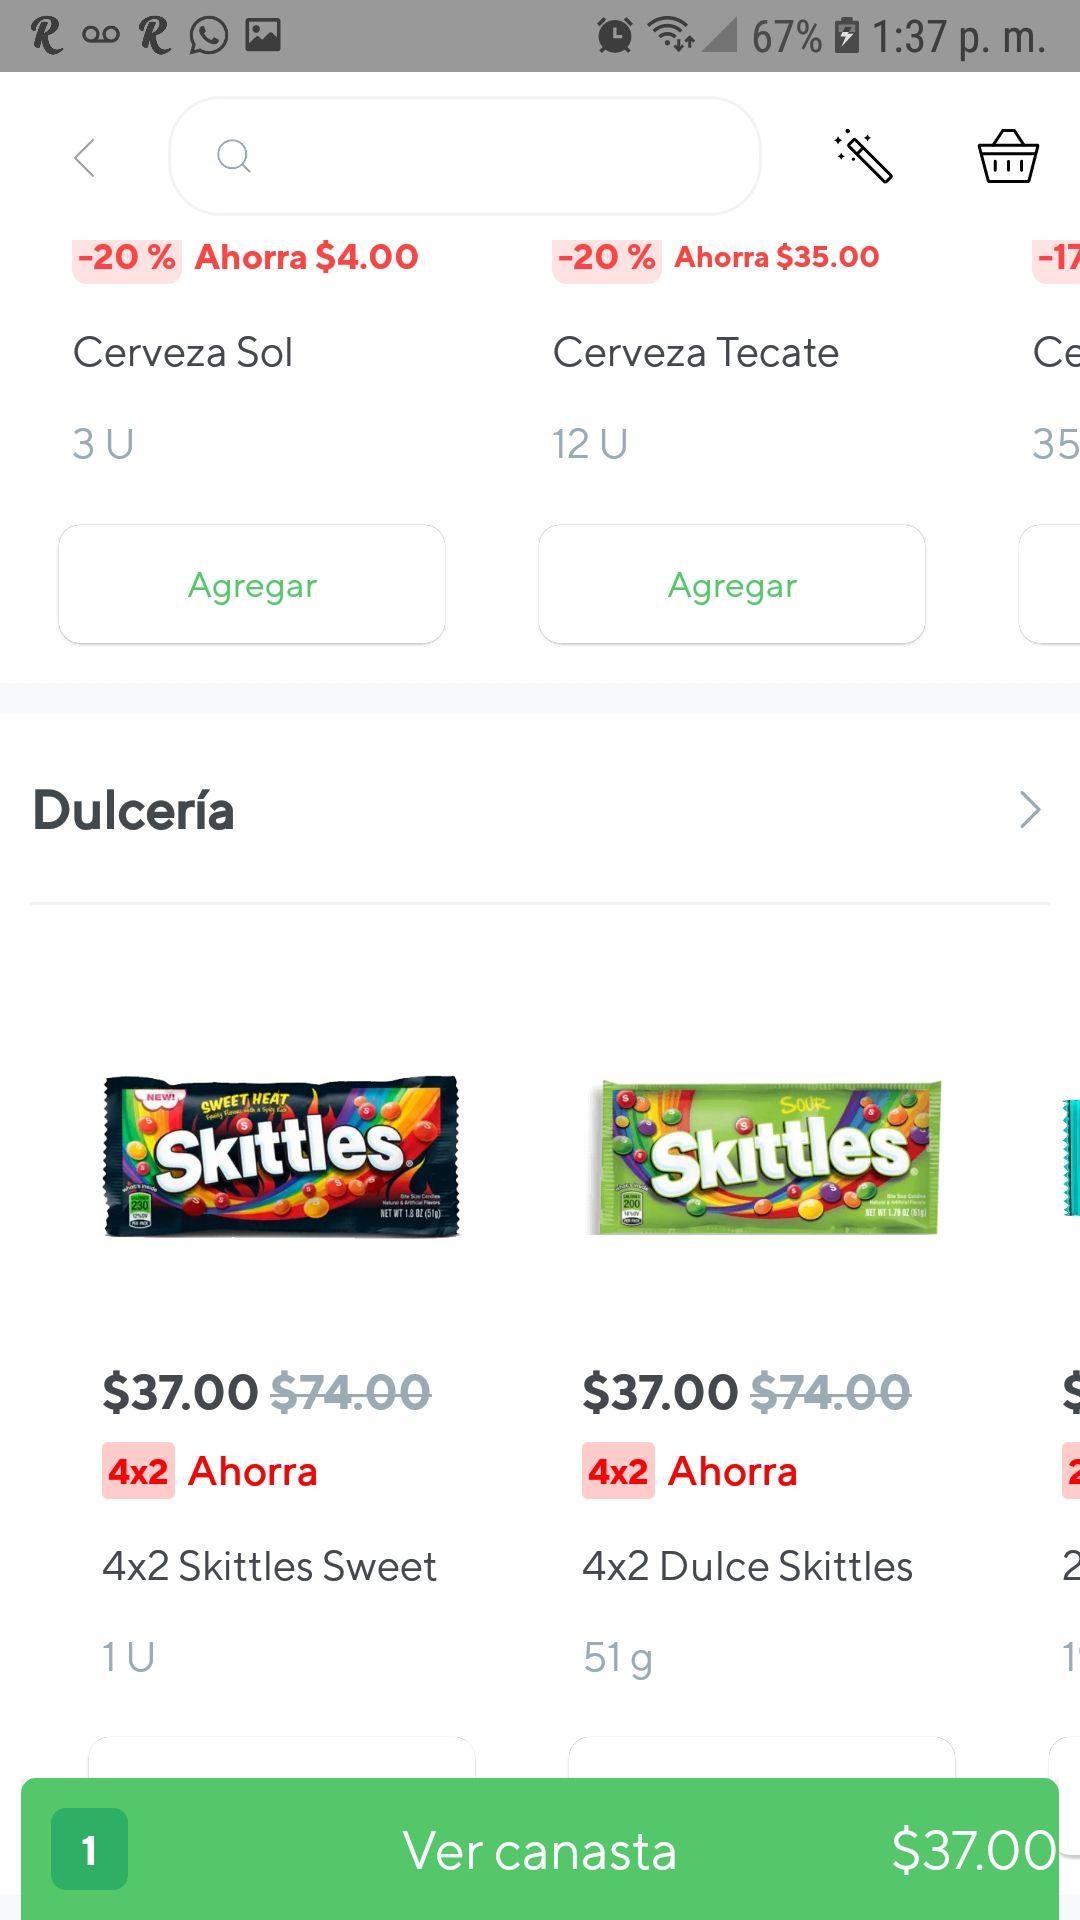 Rappi app: 4x2 en skittles